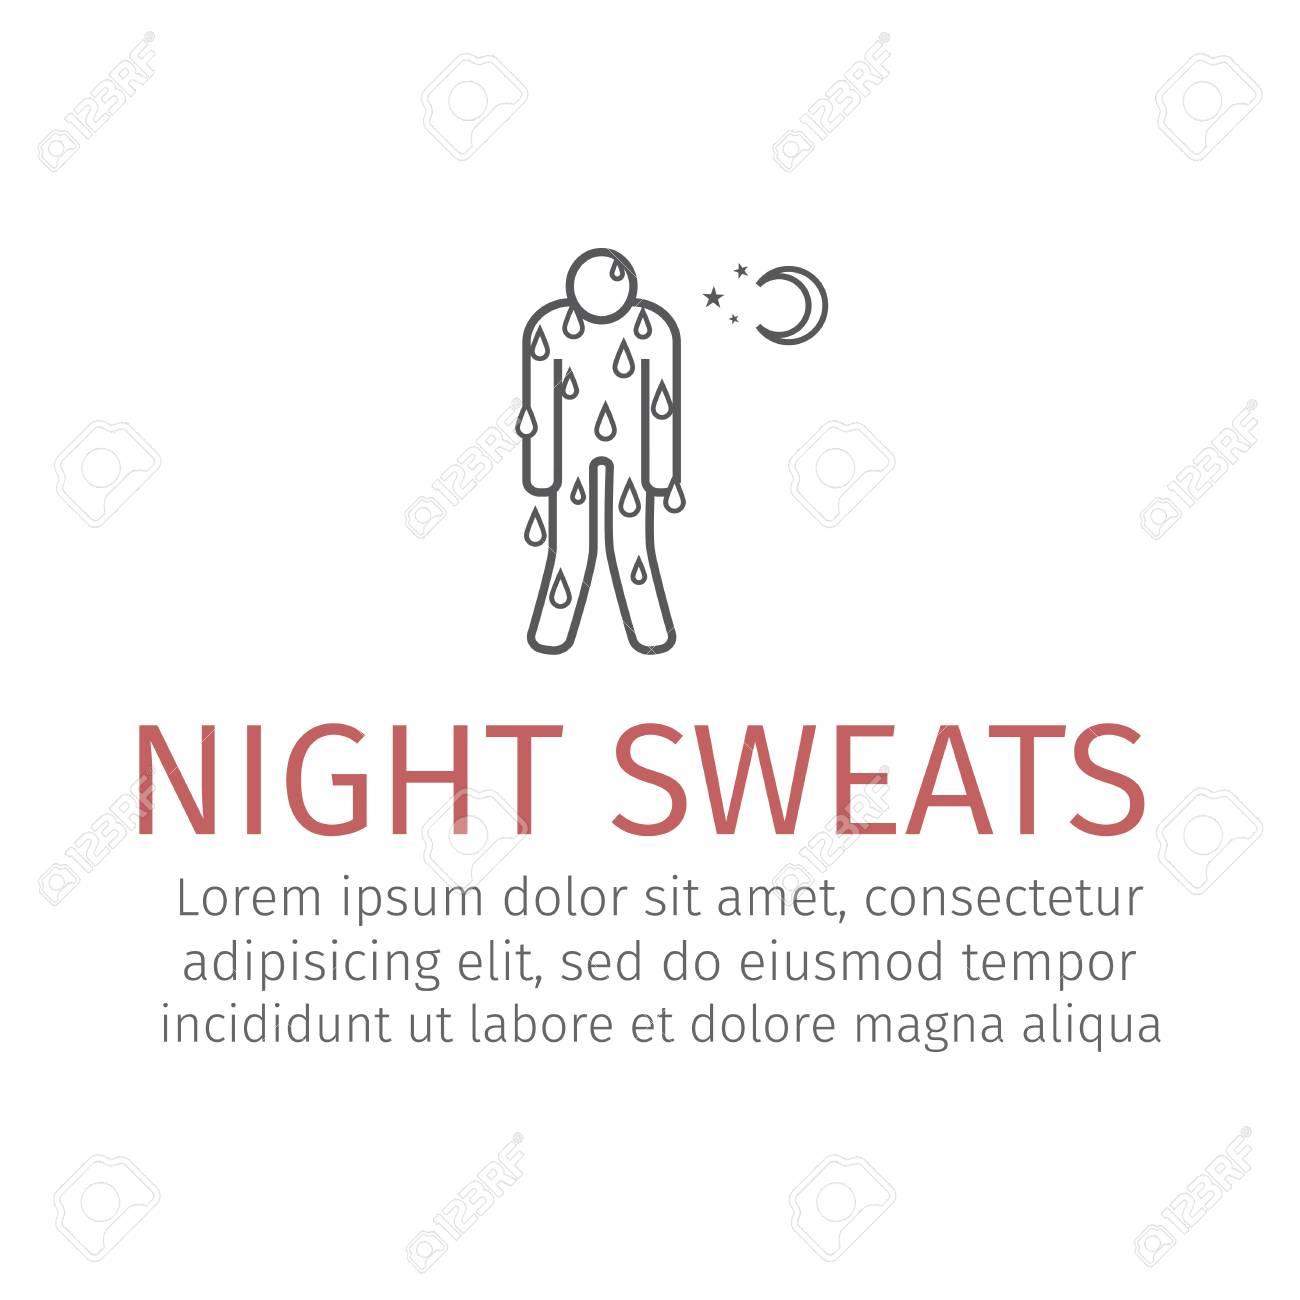 Night Sweats line icon  Vector